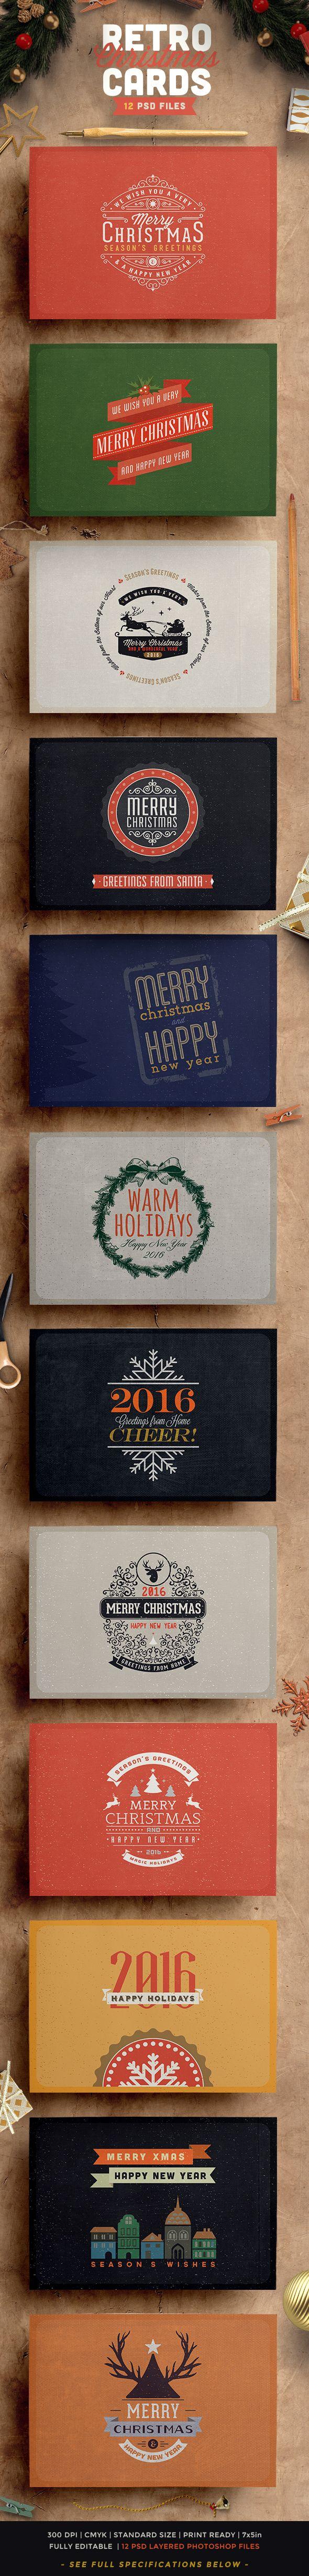 free ecard christmas party invitations%0A Christmas car